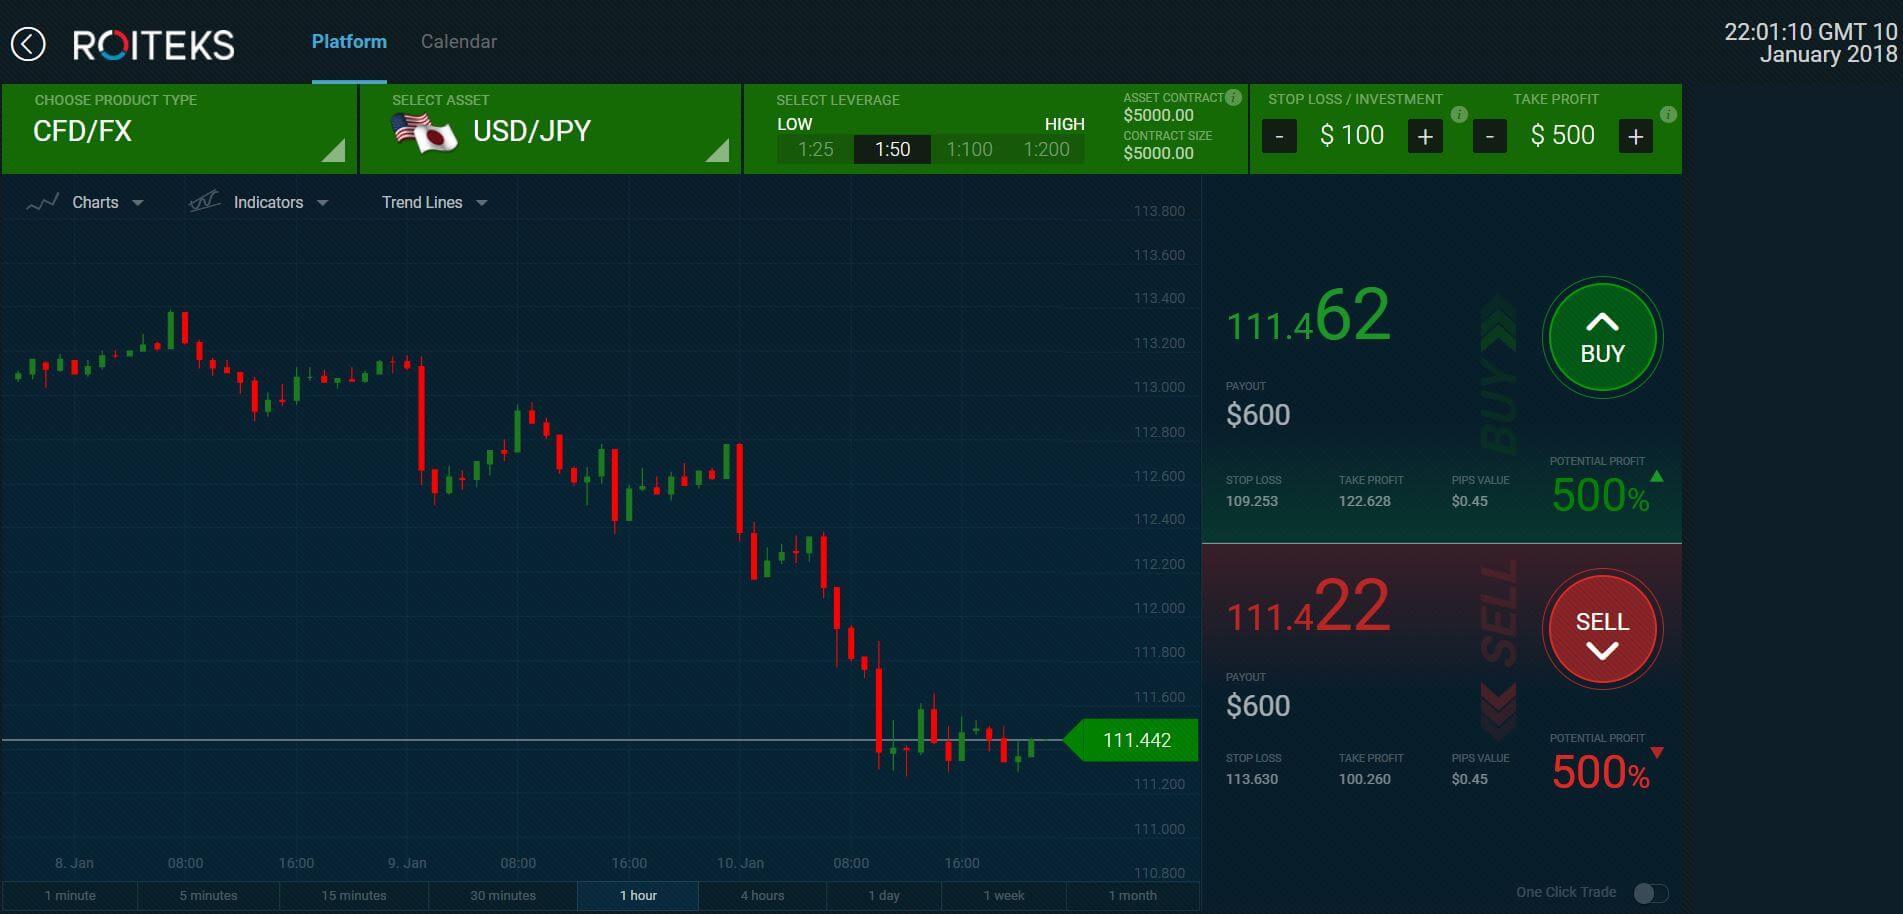 Roiteks Trading Platform